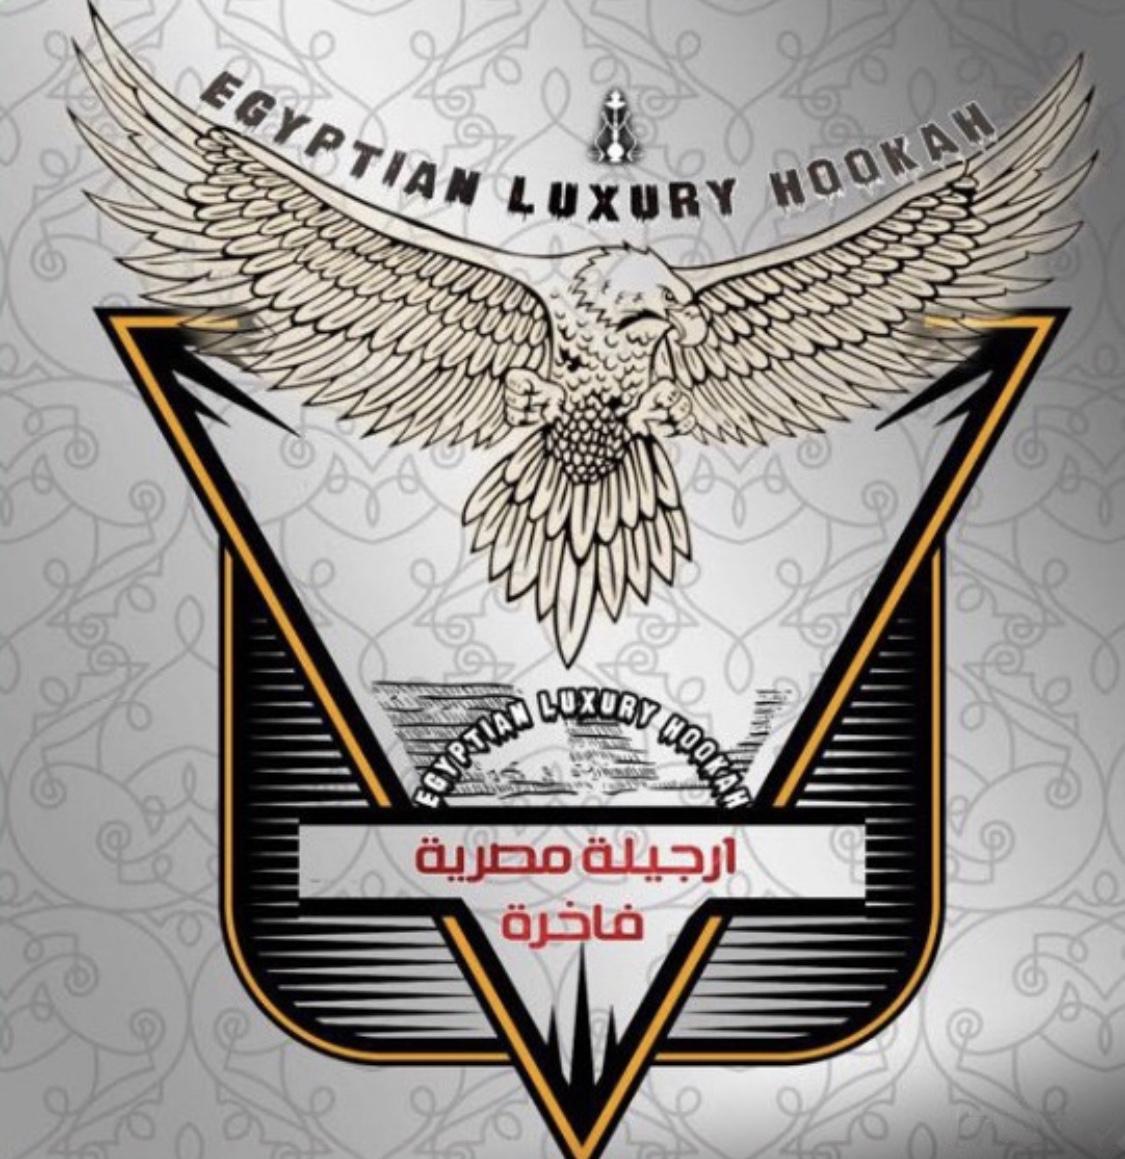 NarghileaDeluxEgipteana.ro